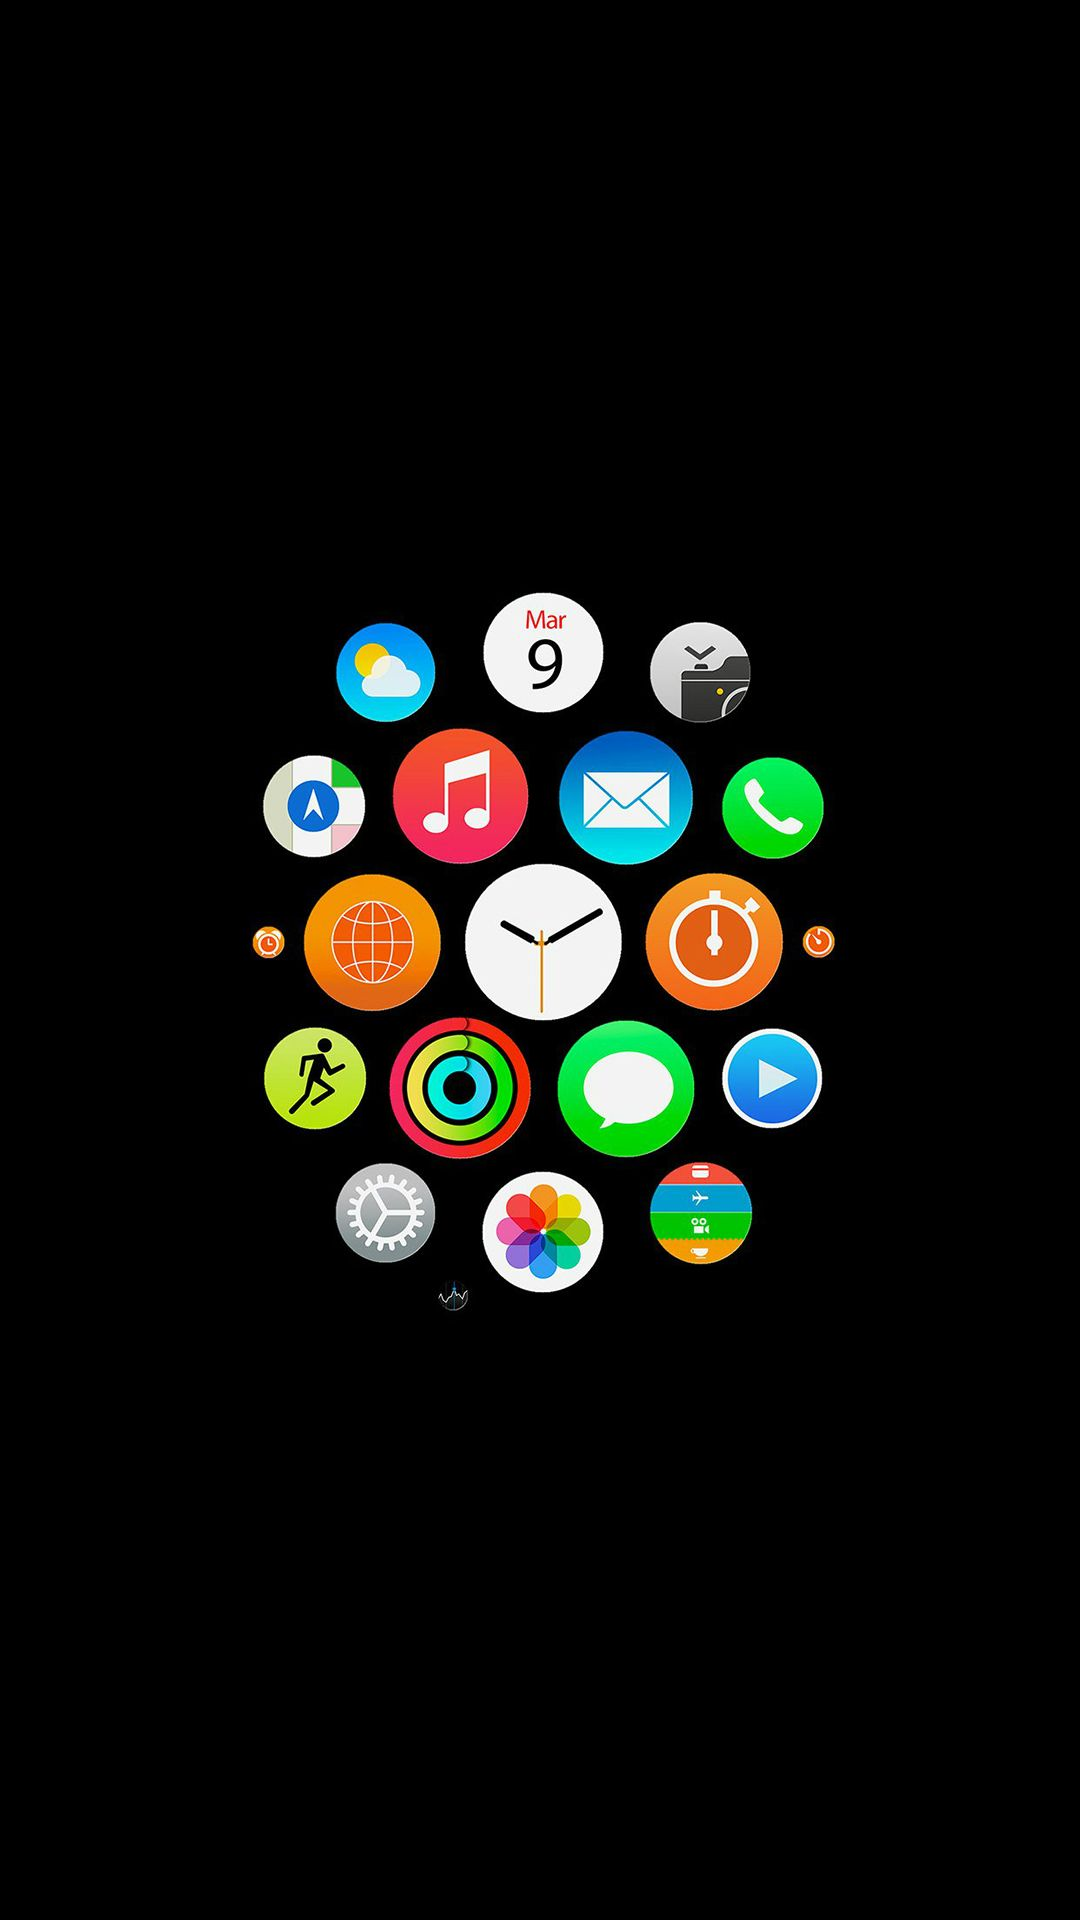 Apple Watch Icons Art Illust Dark iPhone 8 Wallpapers